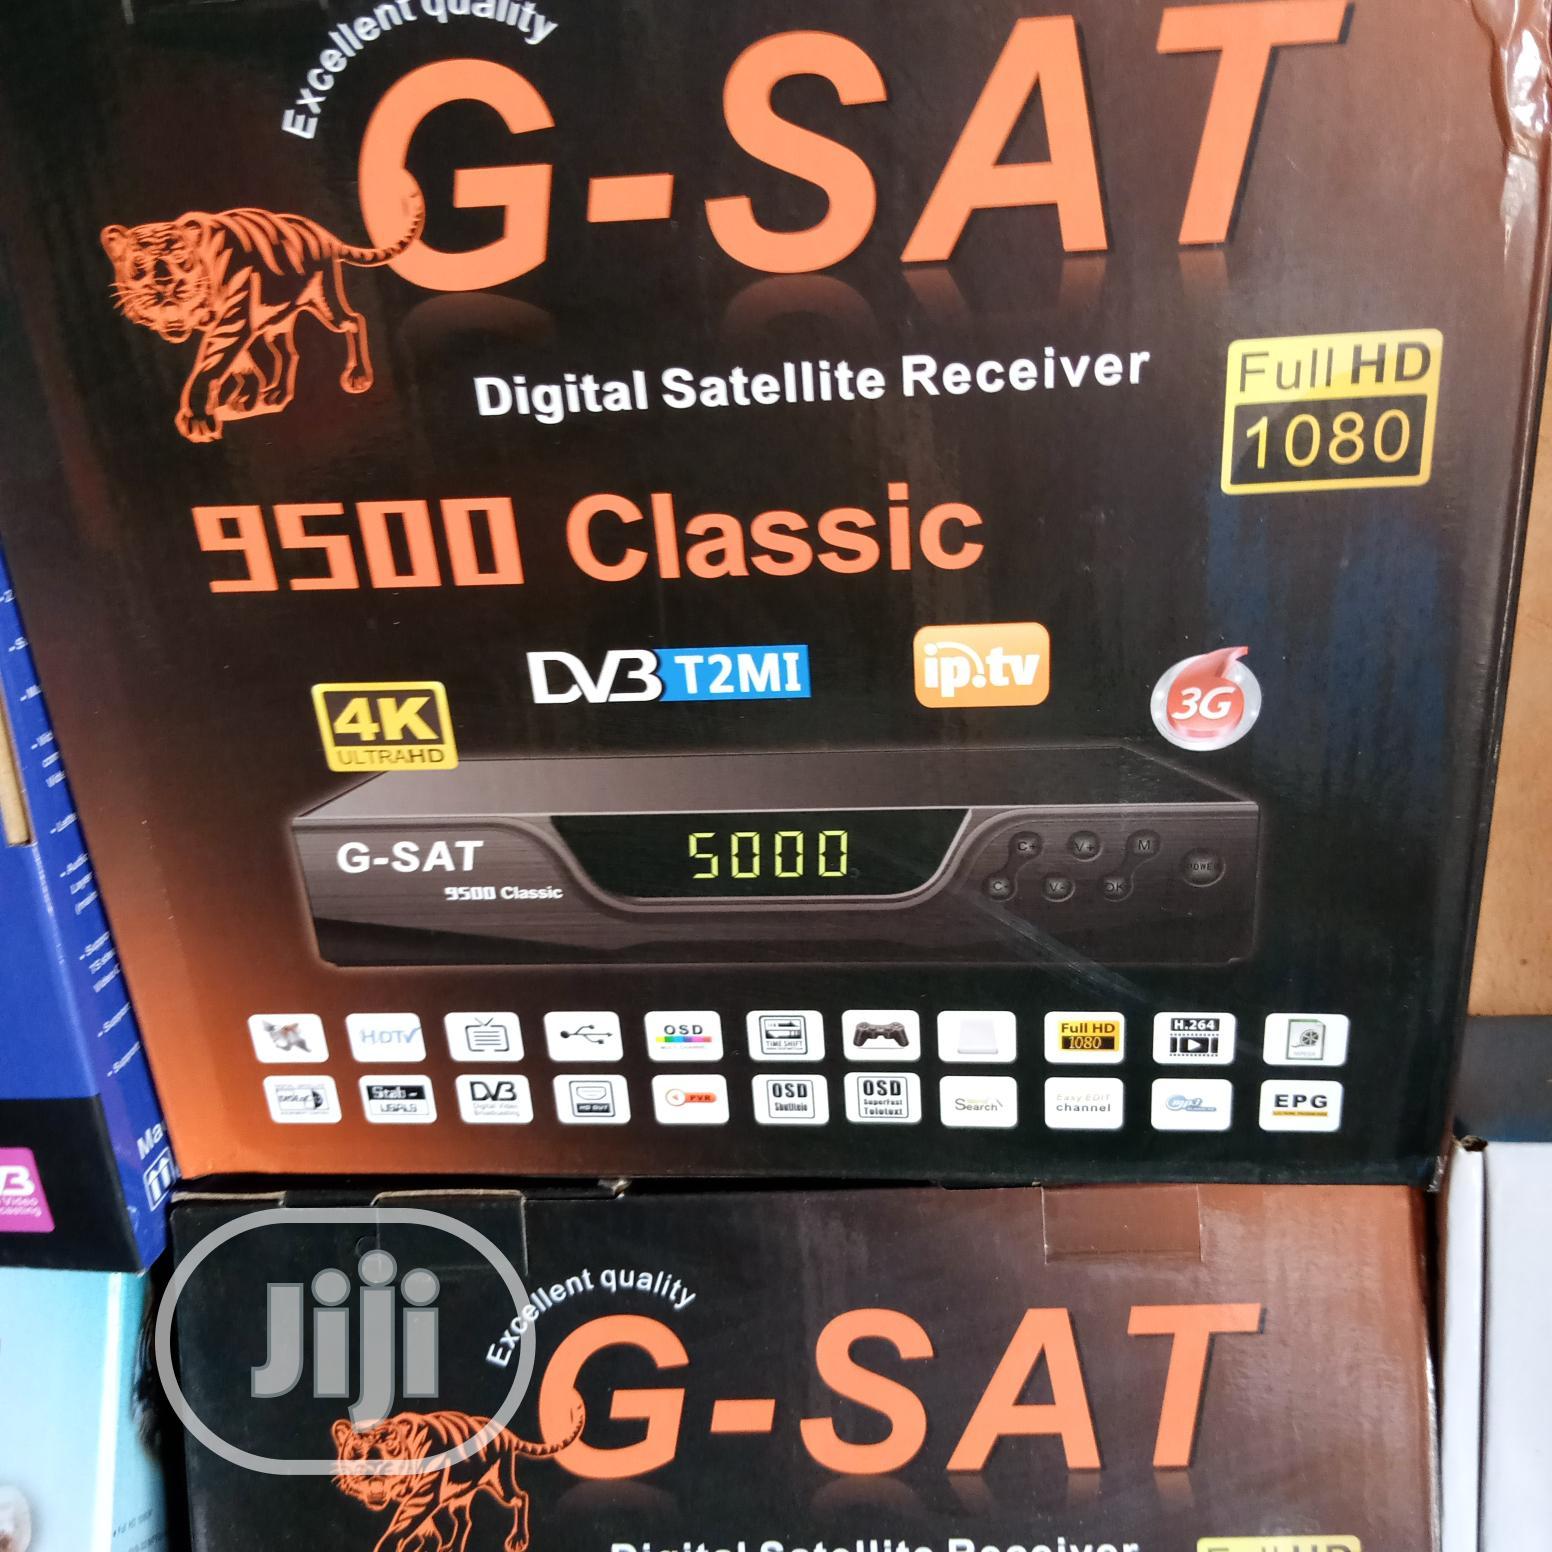 G-sat Digital Satellite Receiver